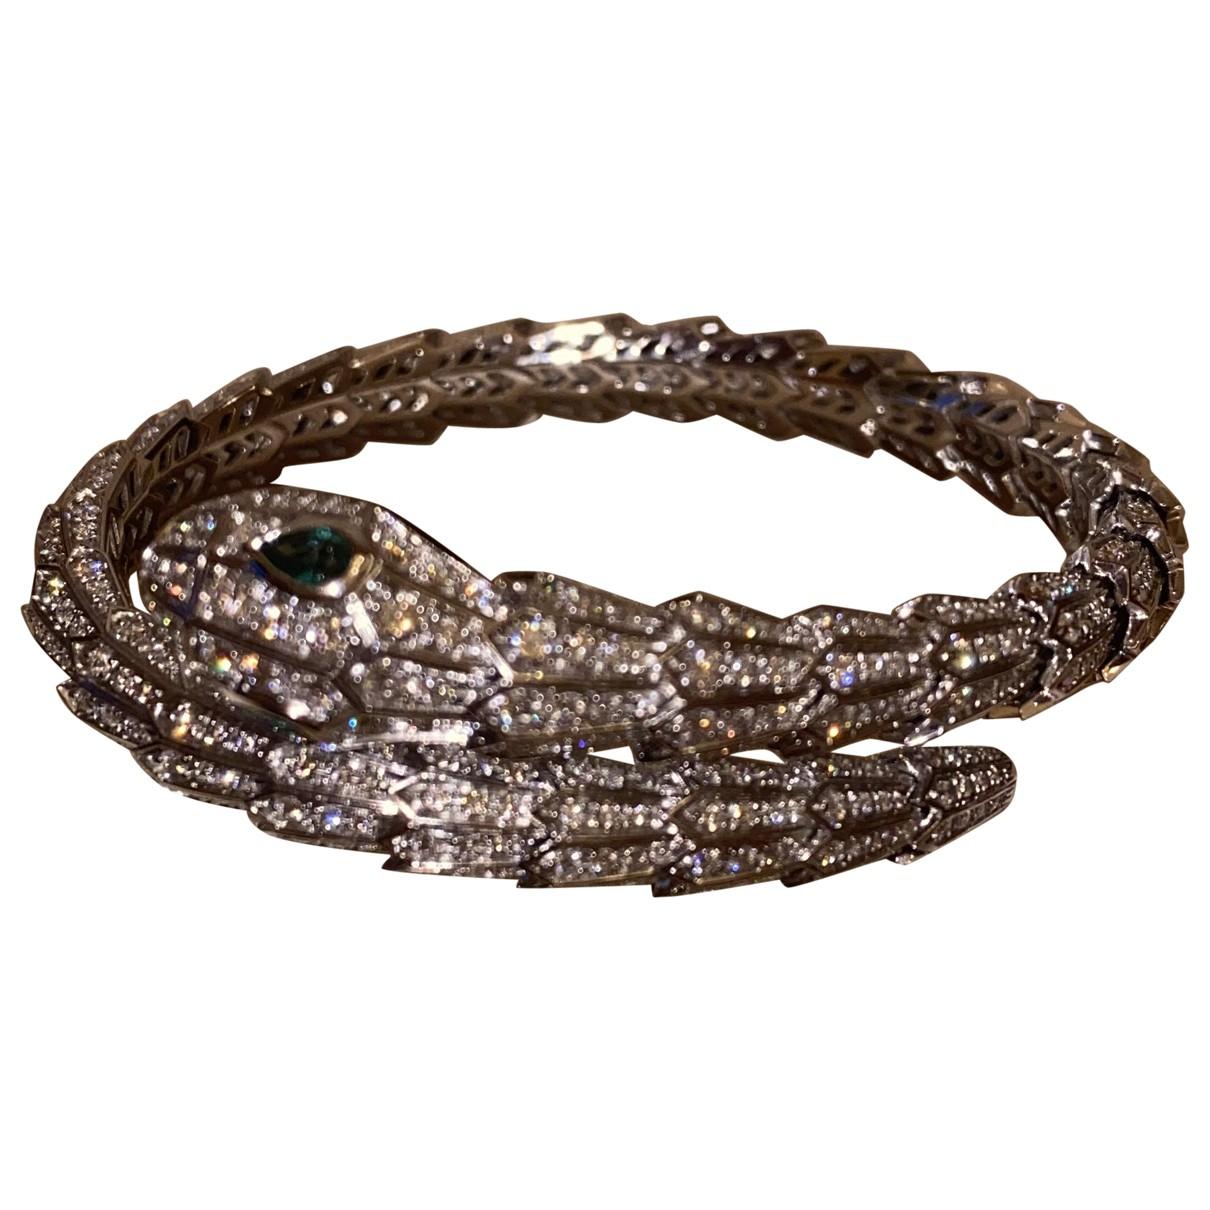 Bvlgari Serpenti Armband in  Metallic Weissgold